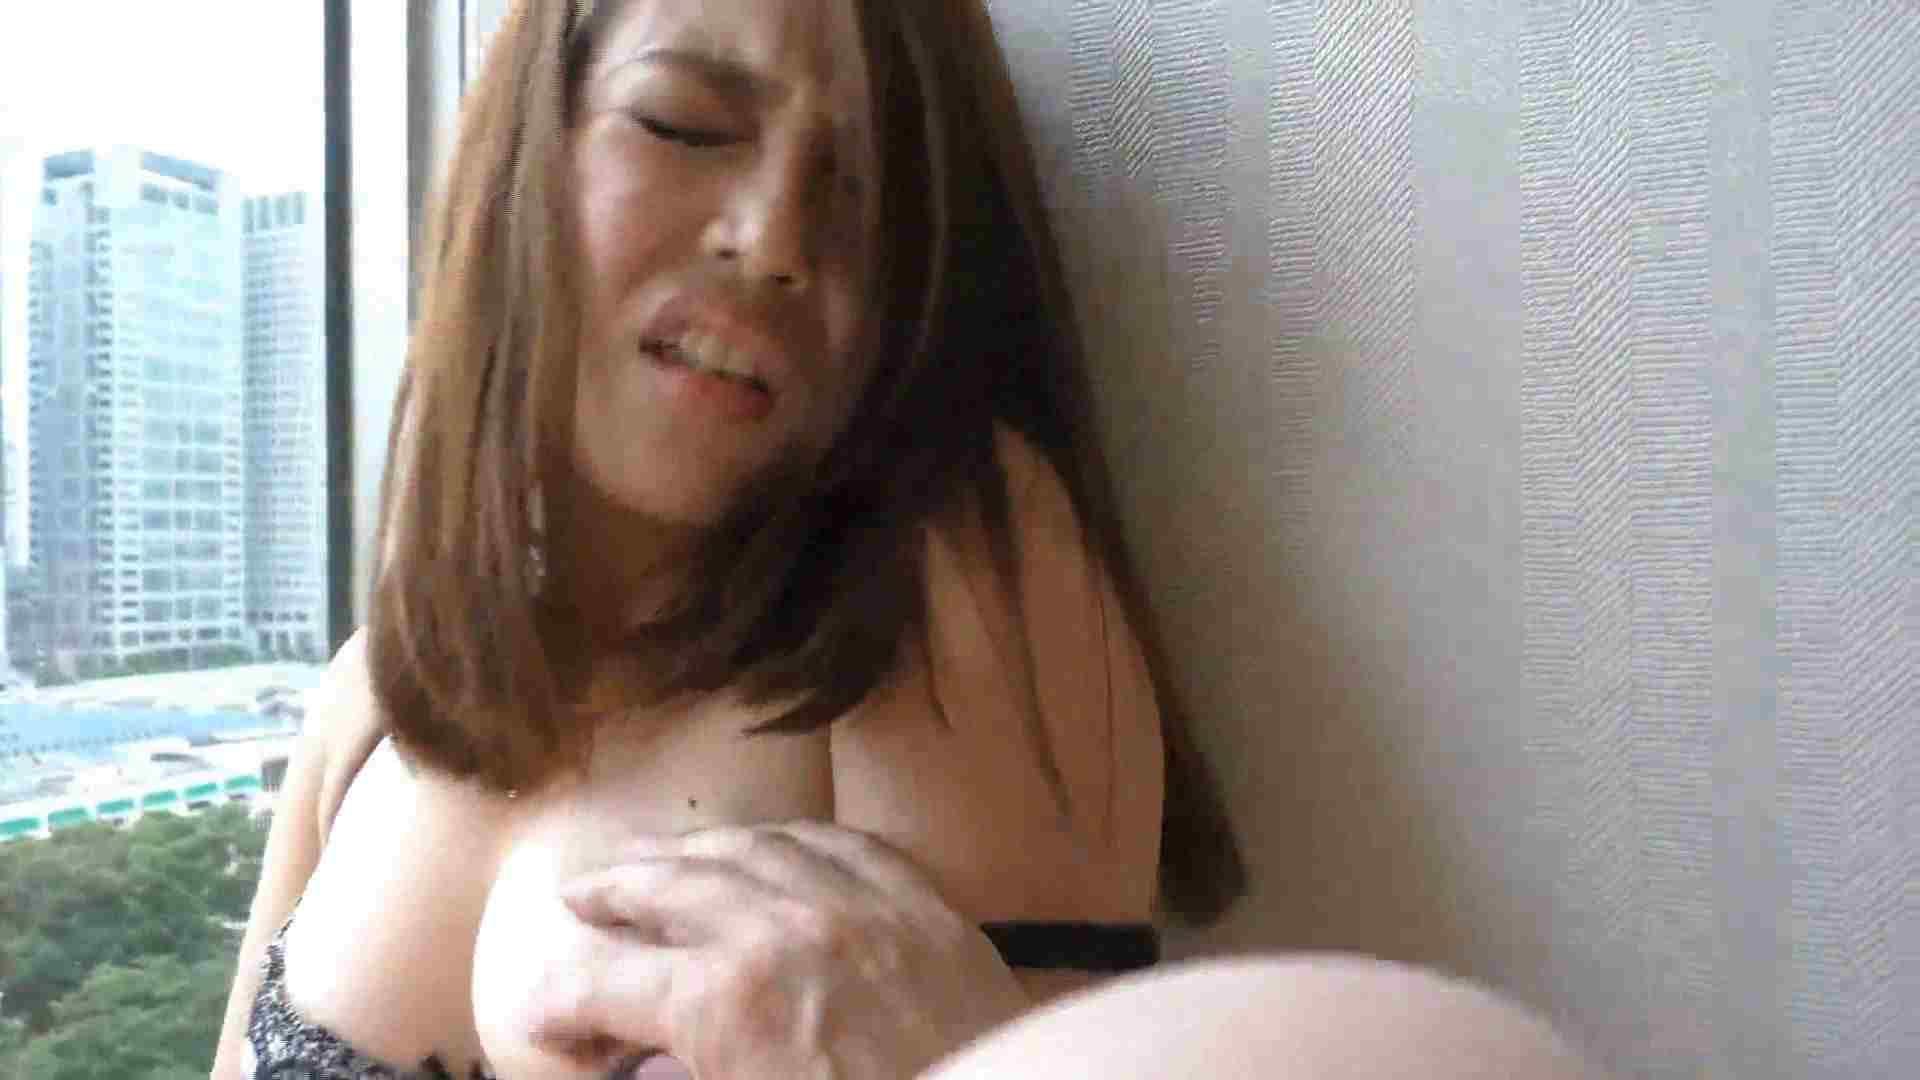 S級厳選美女ビッチガールVol.21 美女  77枚 68